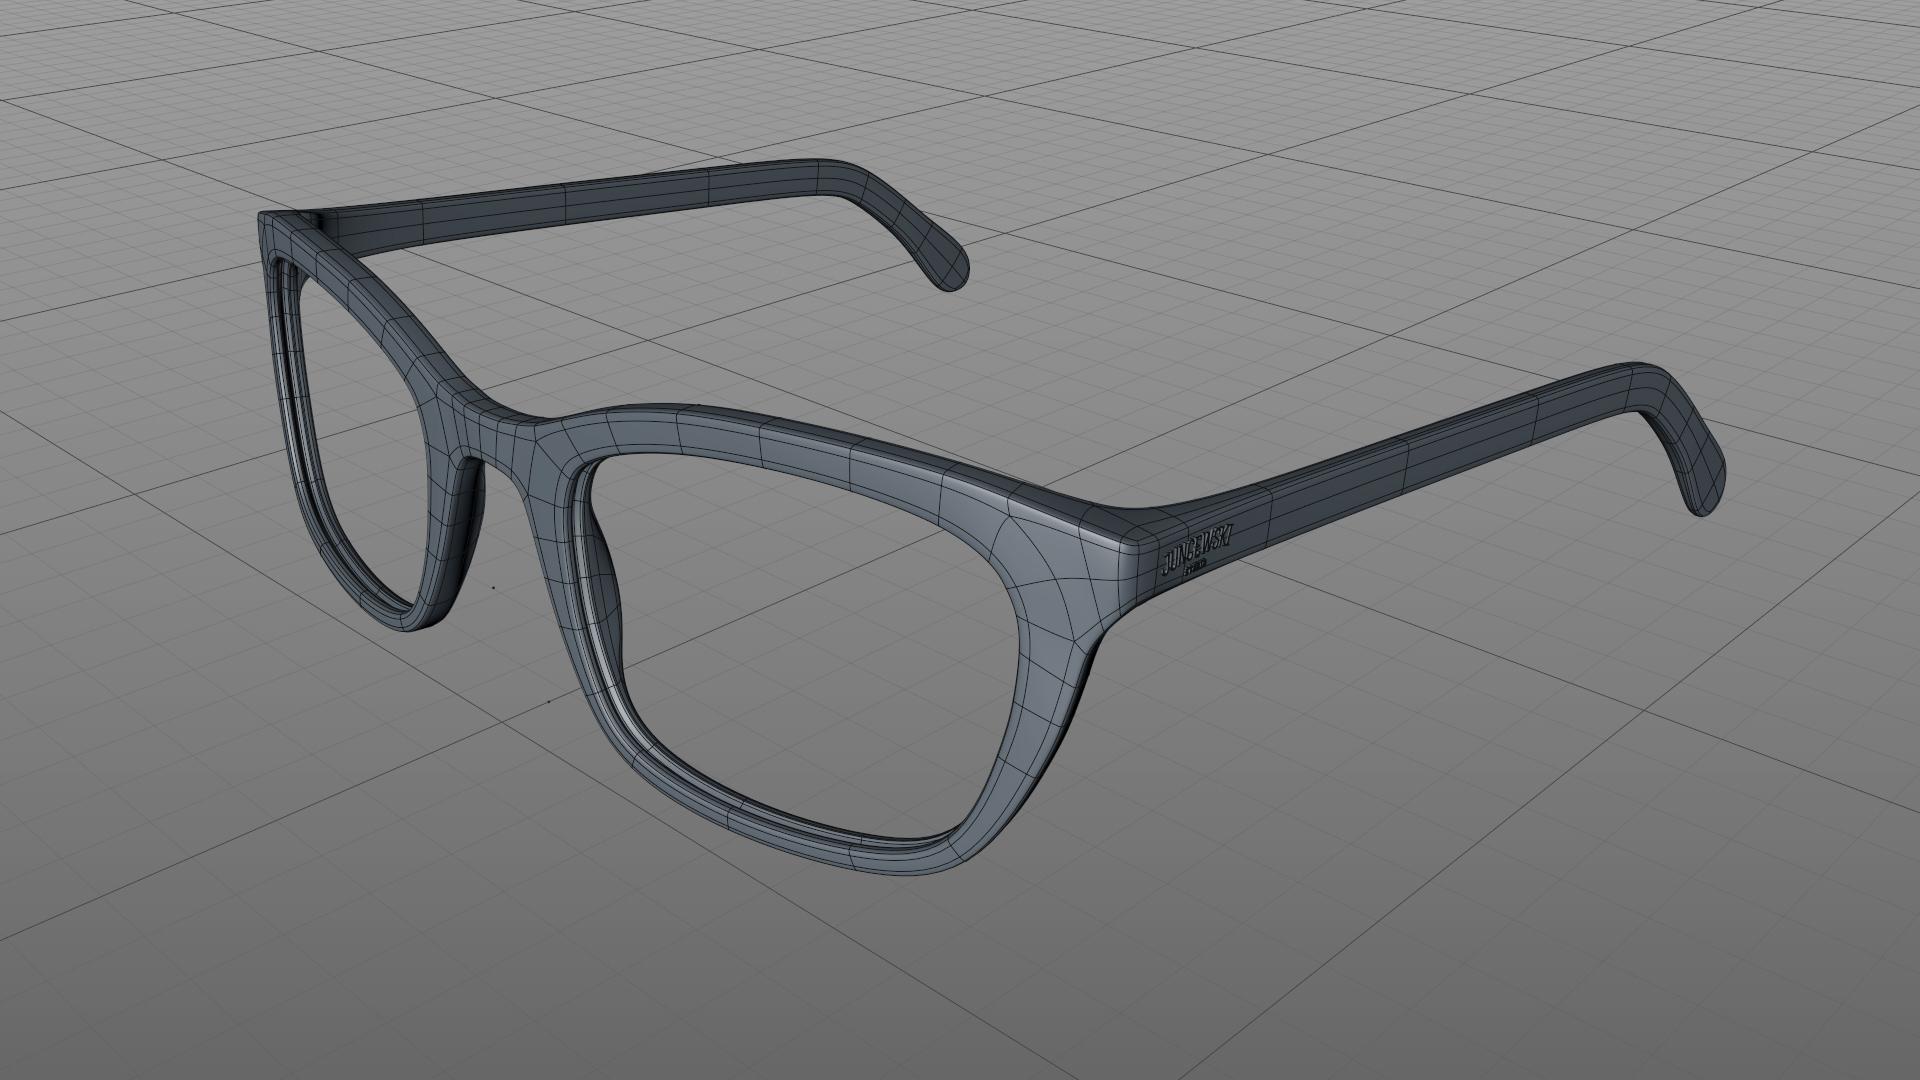 2015 – 3D Printed Sunglasses